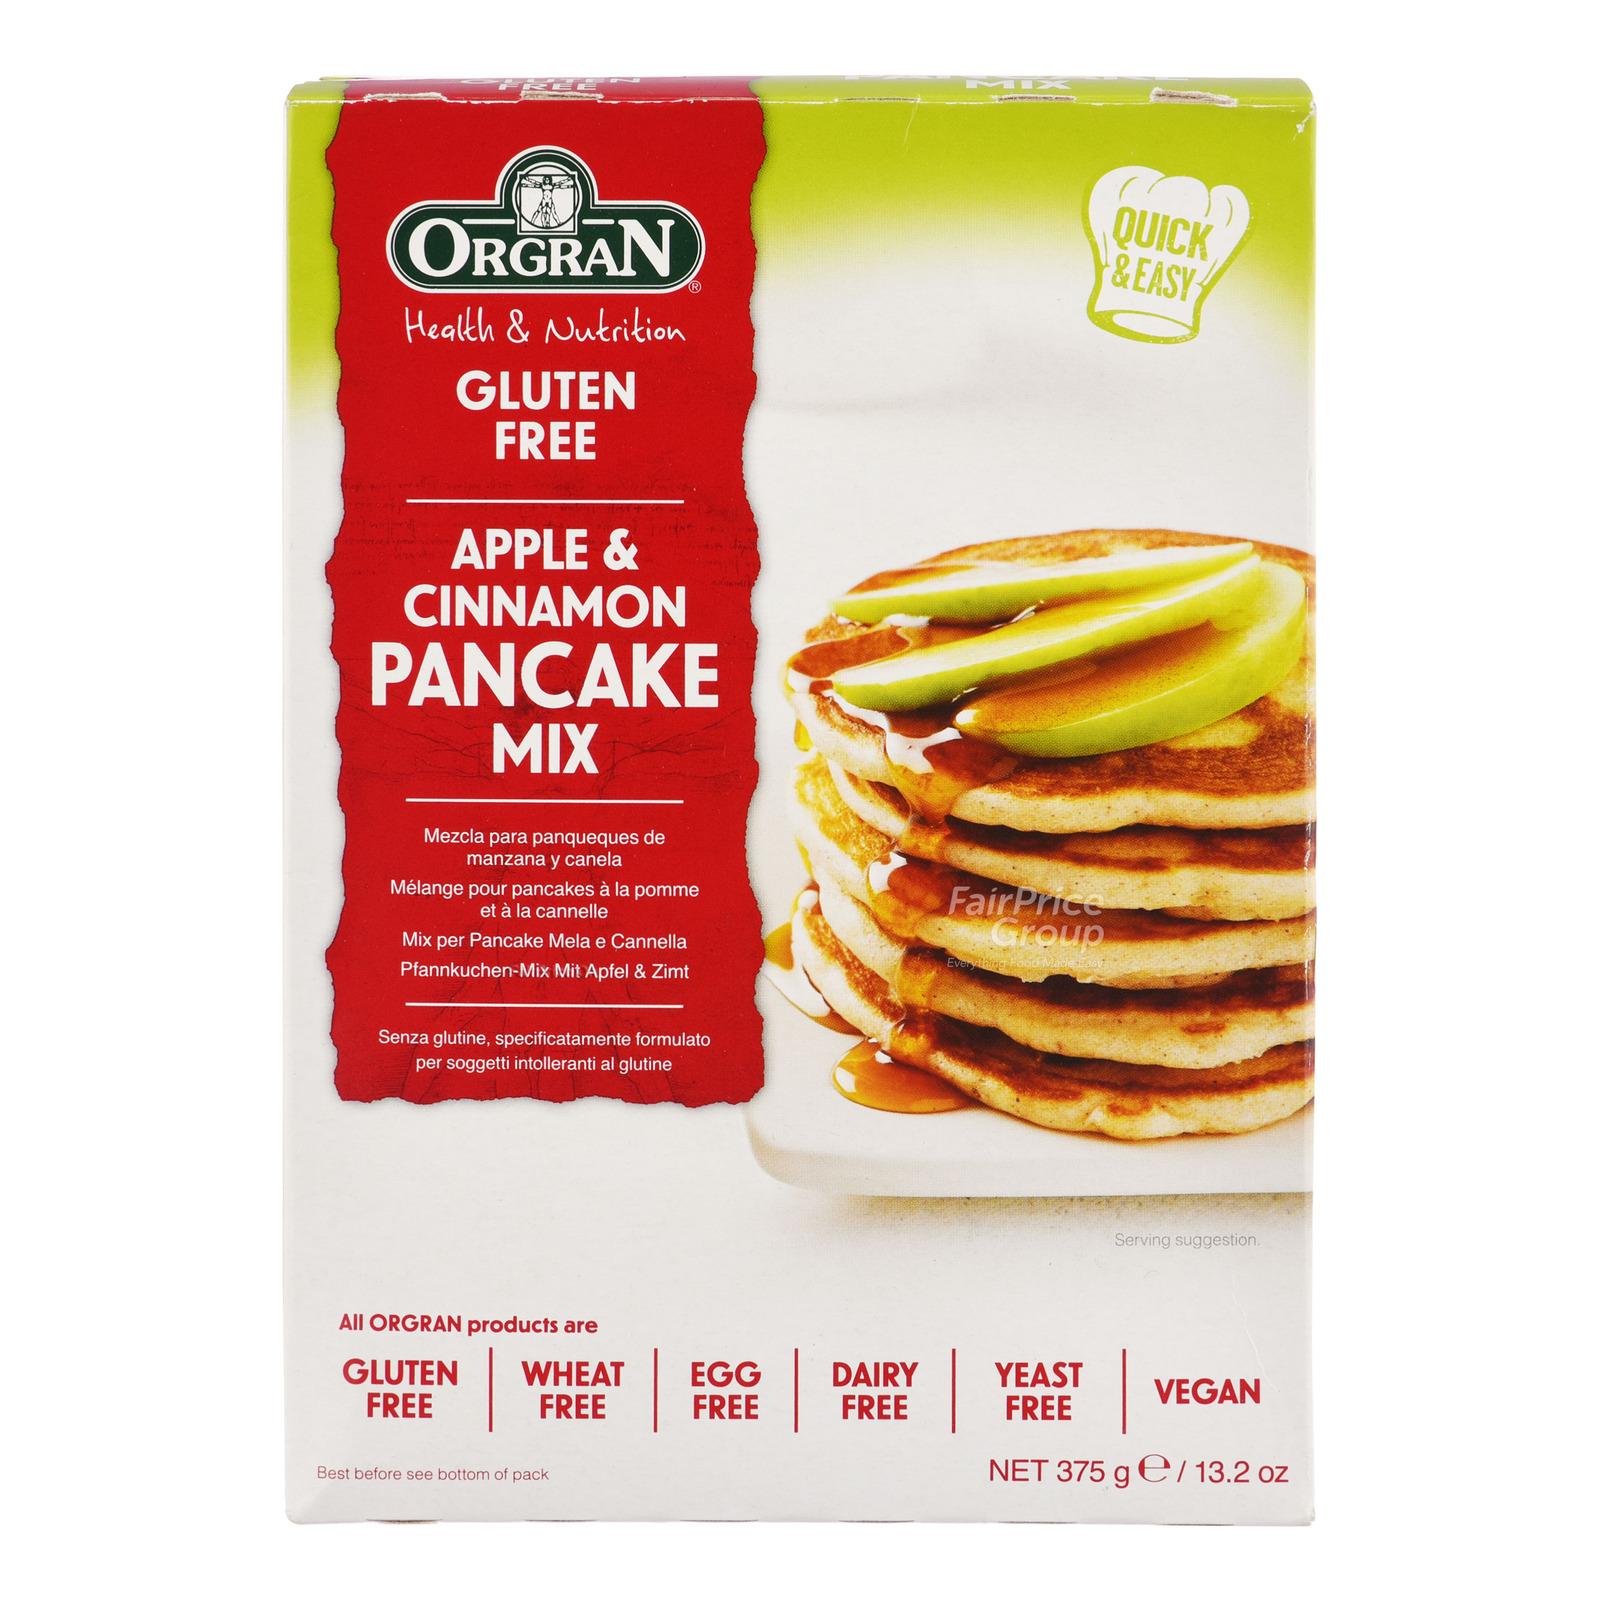 Orgran Gluten Free Pancake Mix - Apple & Cinnamon